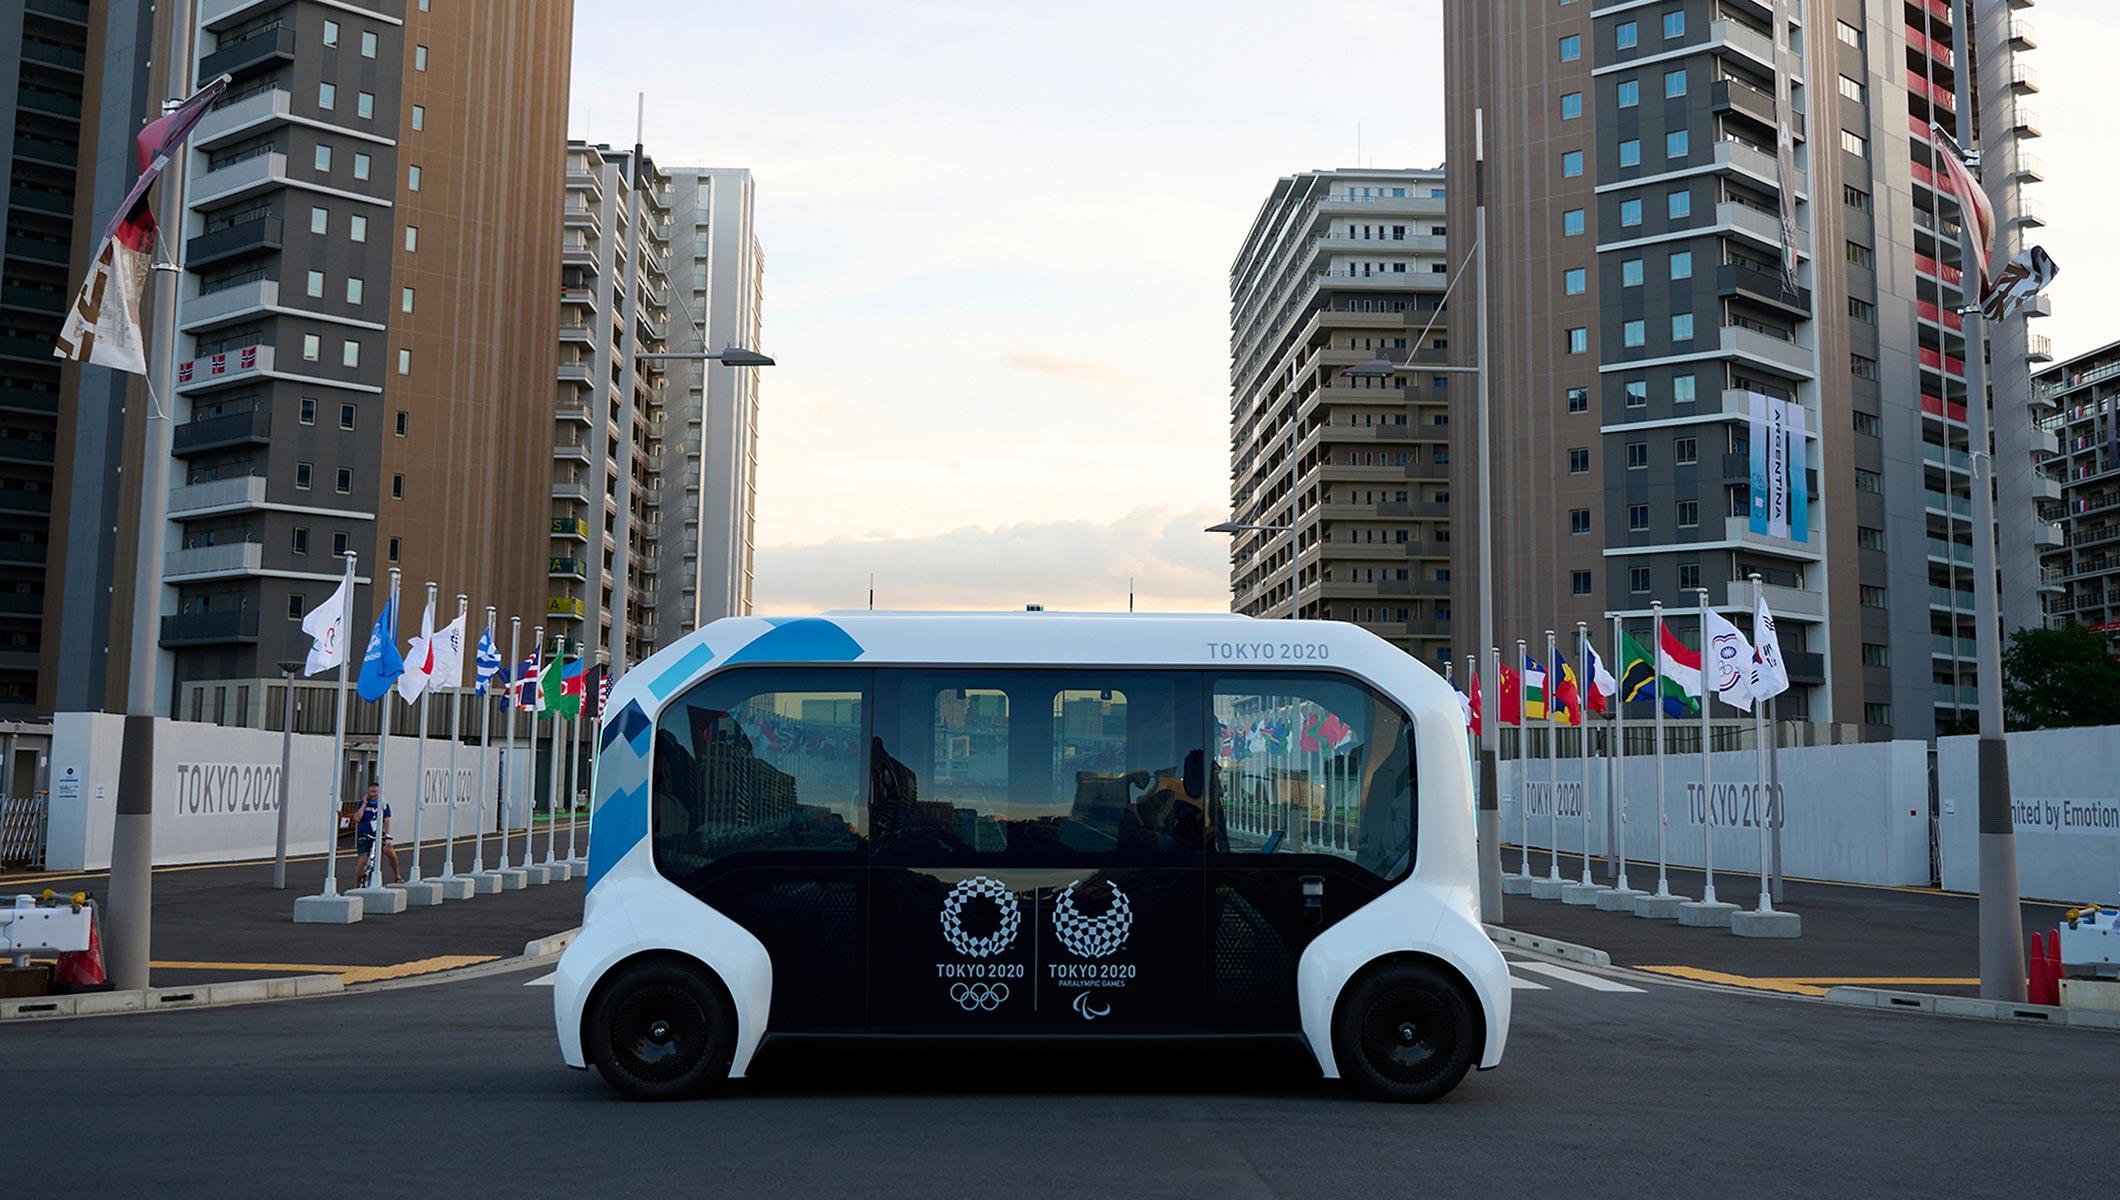 Tokyo 2020 Olympic Village